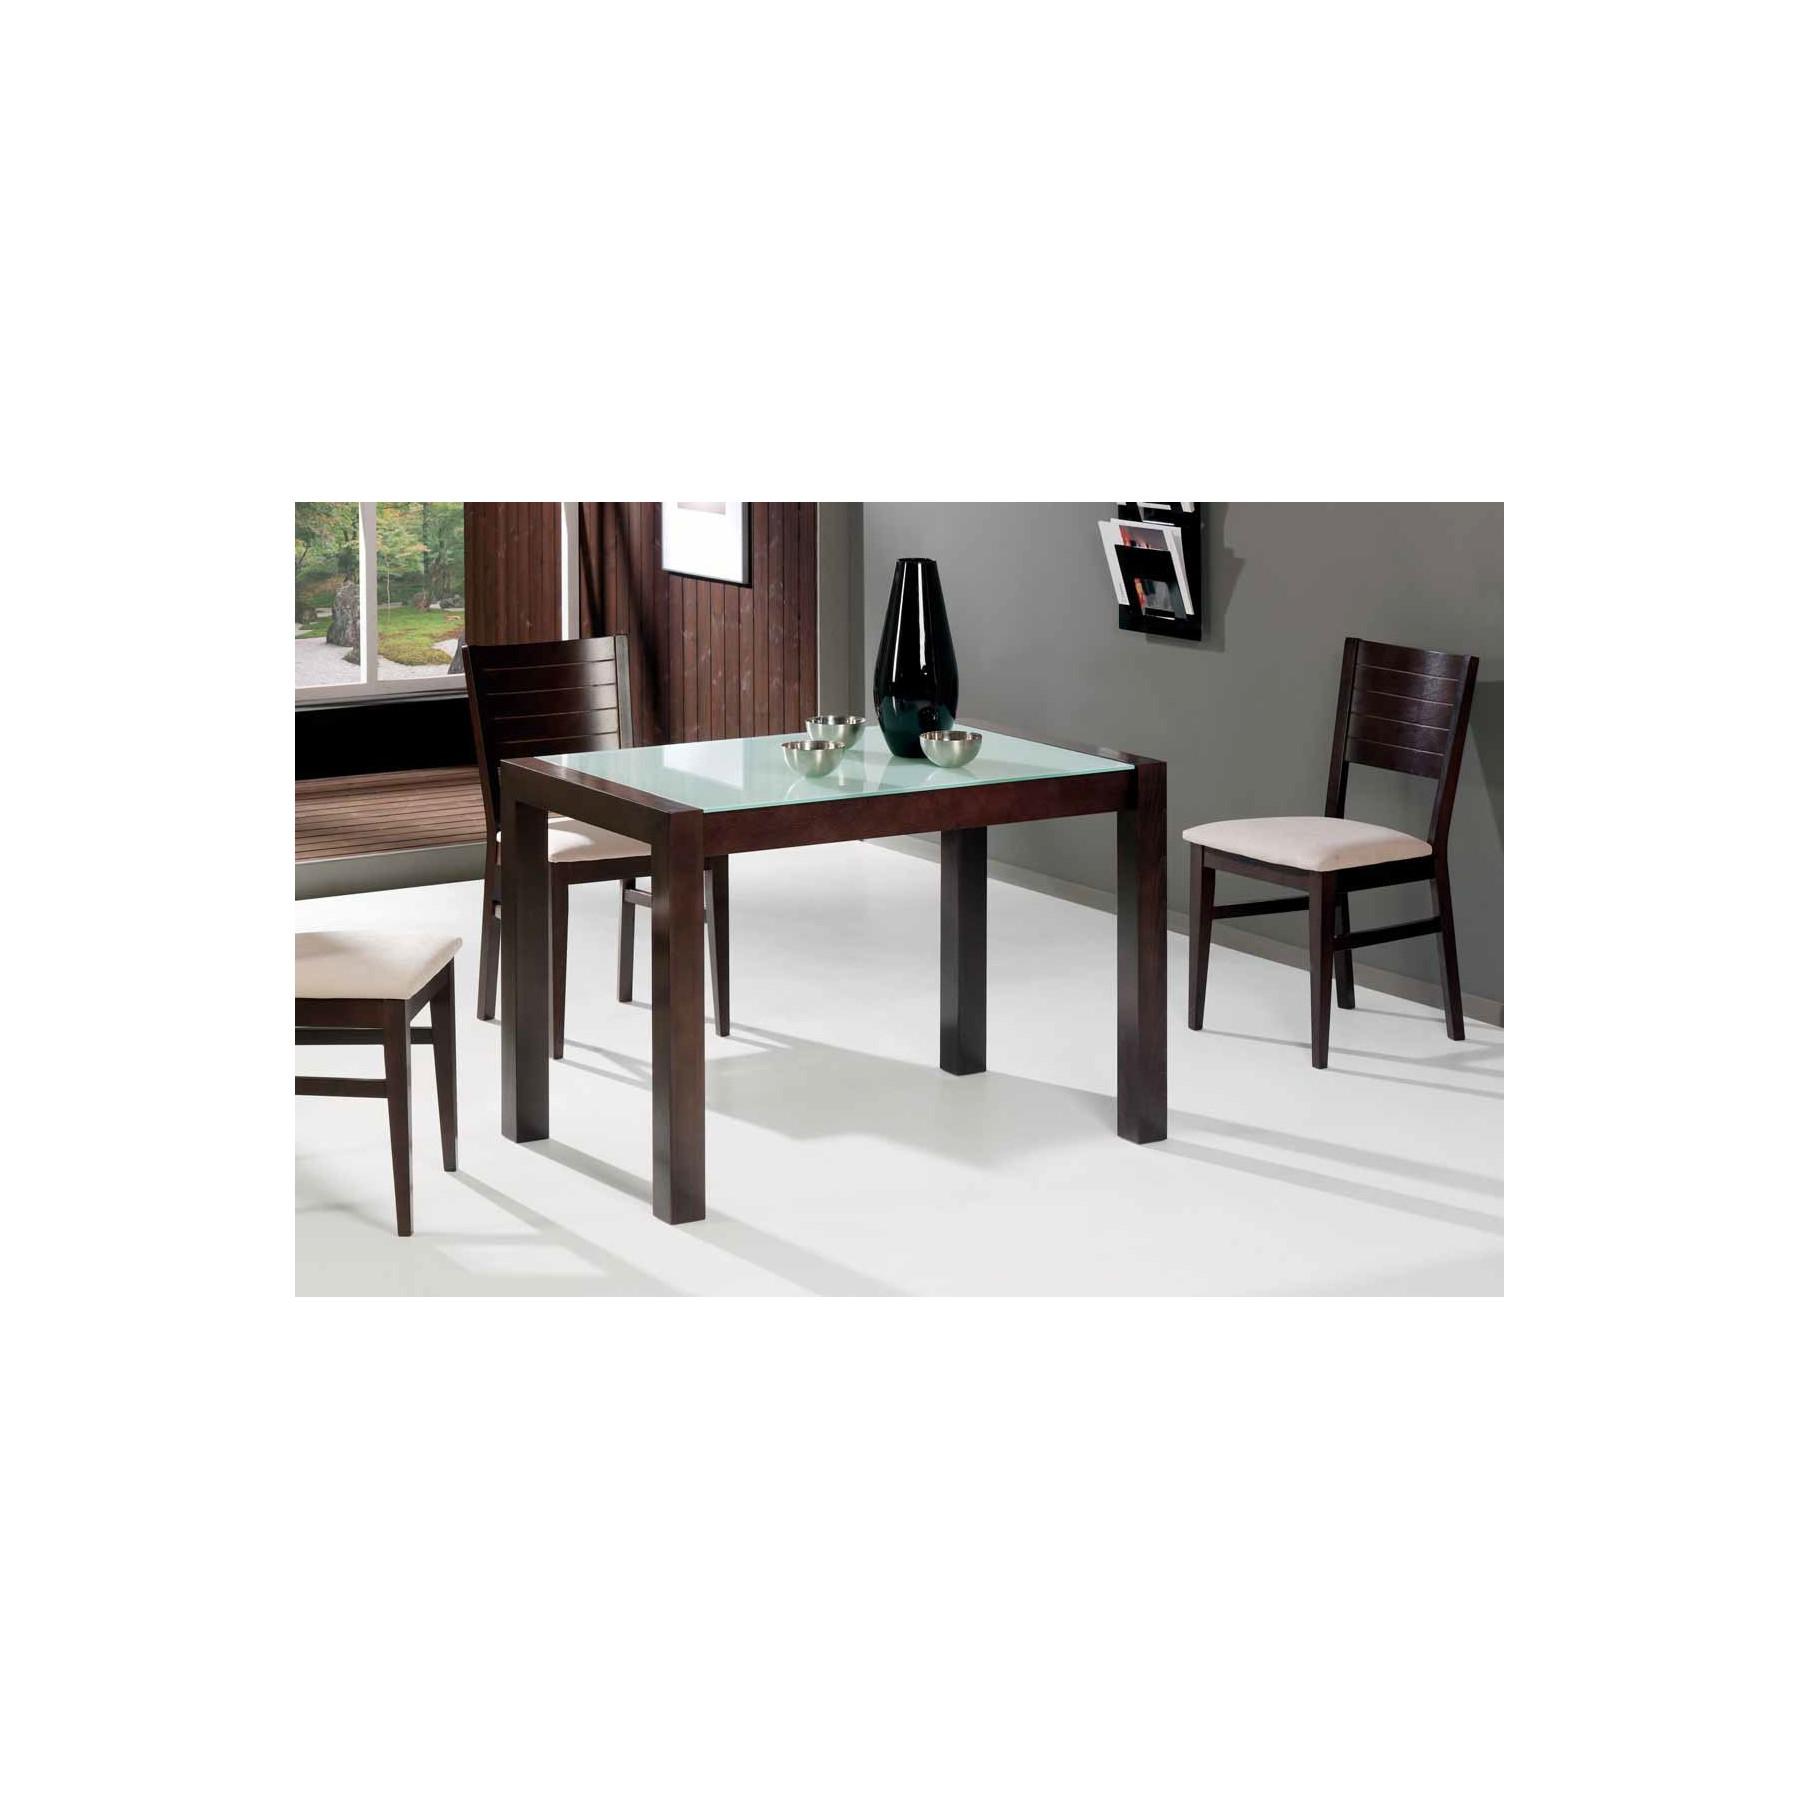 Mesa de cocina de madera extensible y cristal templado - Mesa de madera para cocina ...